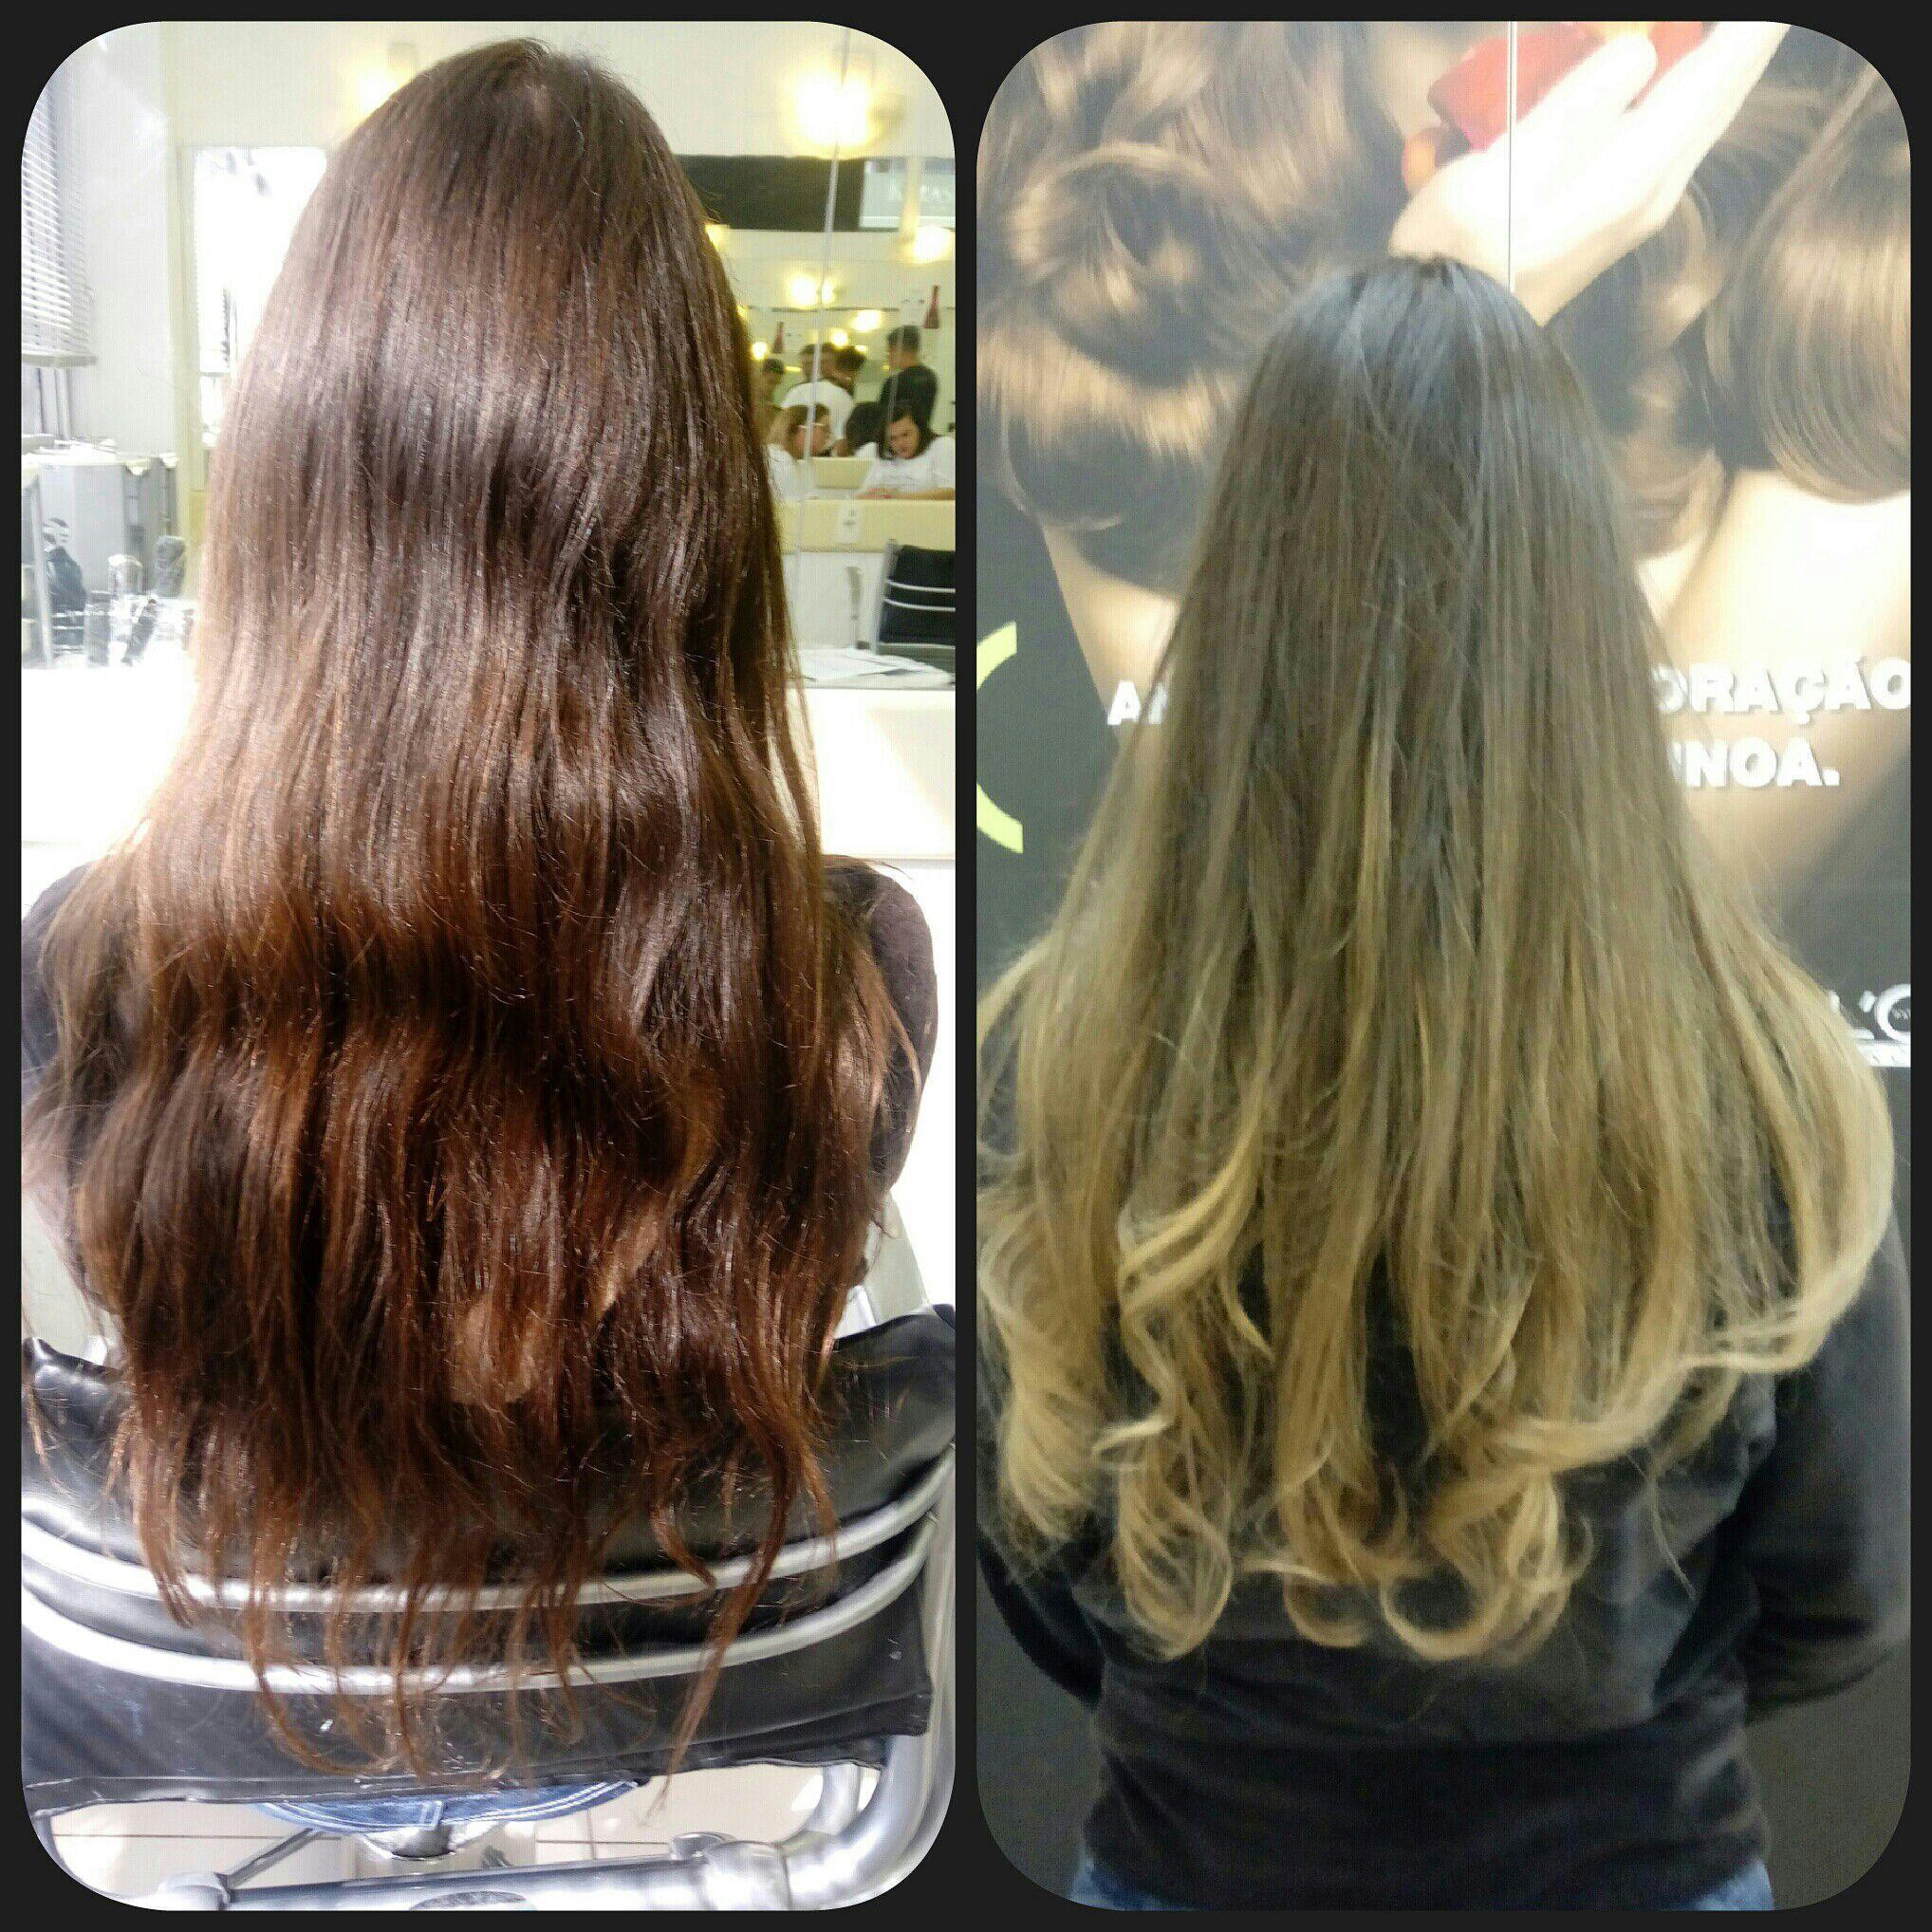 cabelo esteticista cabeleireiro(a) designer de sobrancelhas cabeleireiro(a) esteticista cabeleireiro(a)